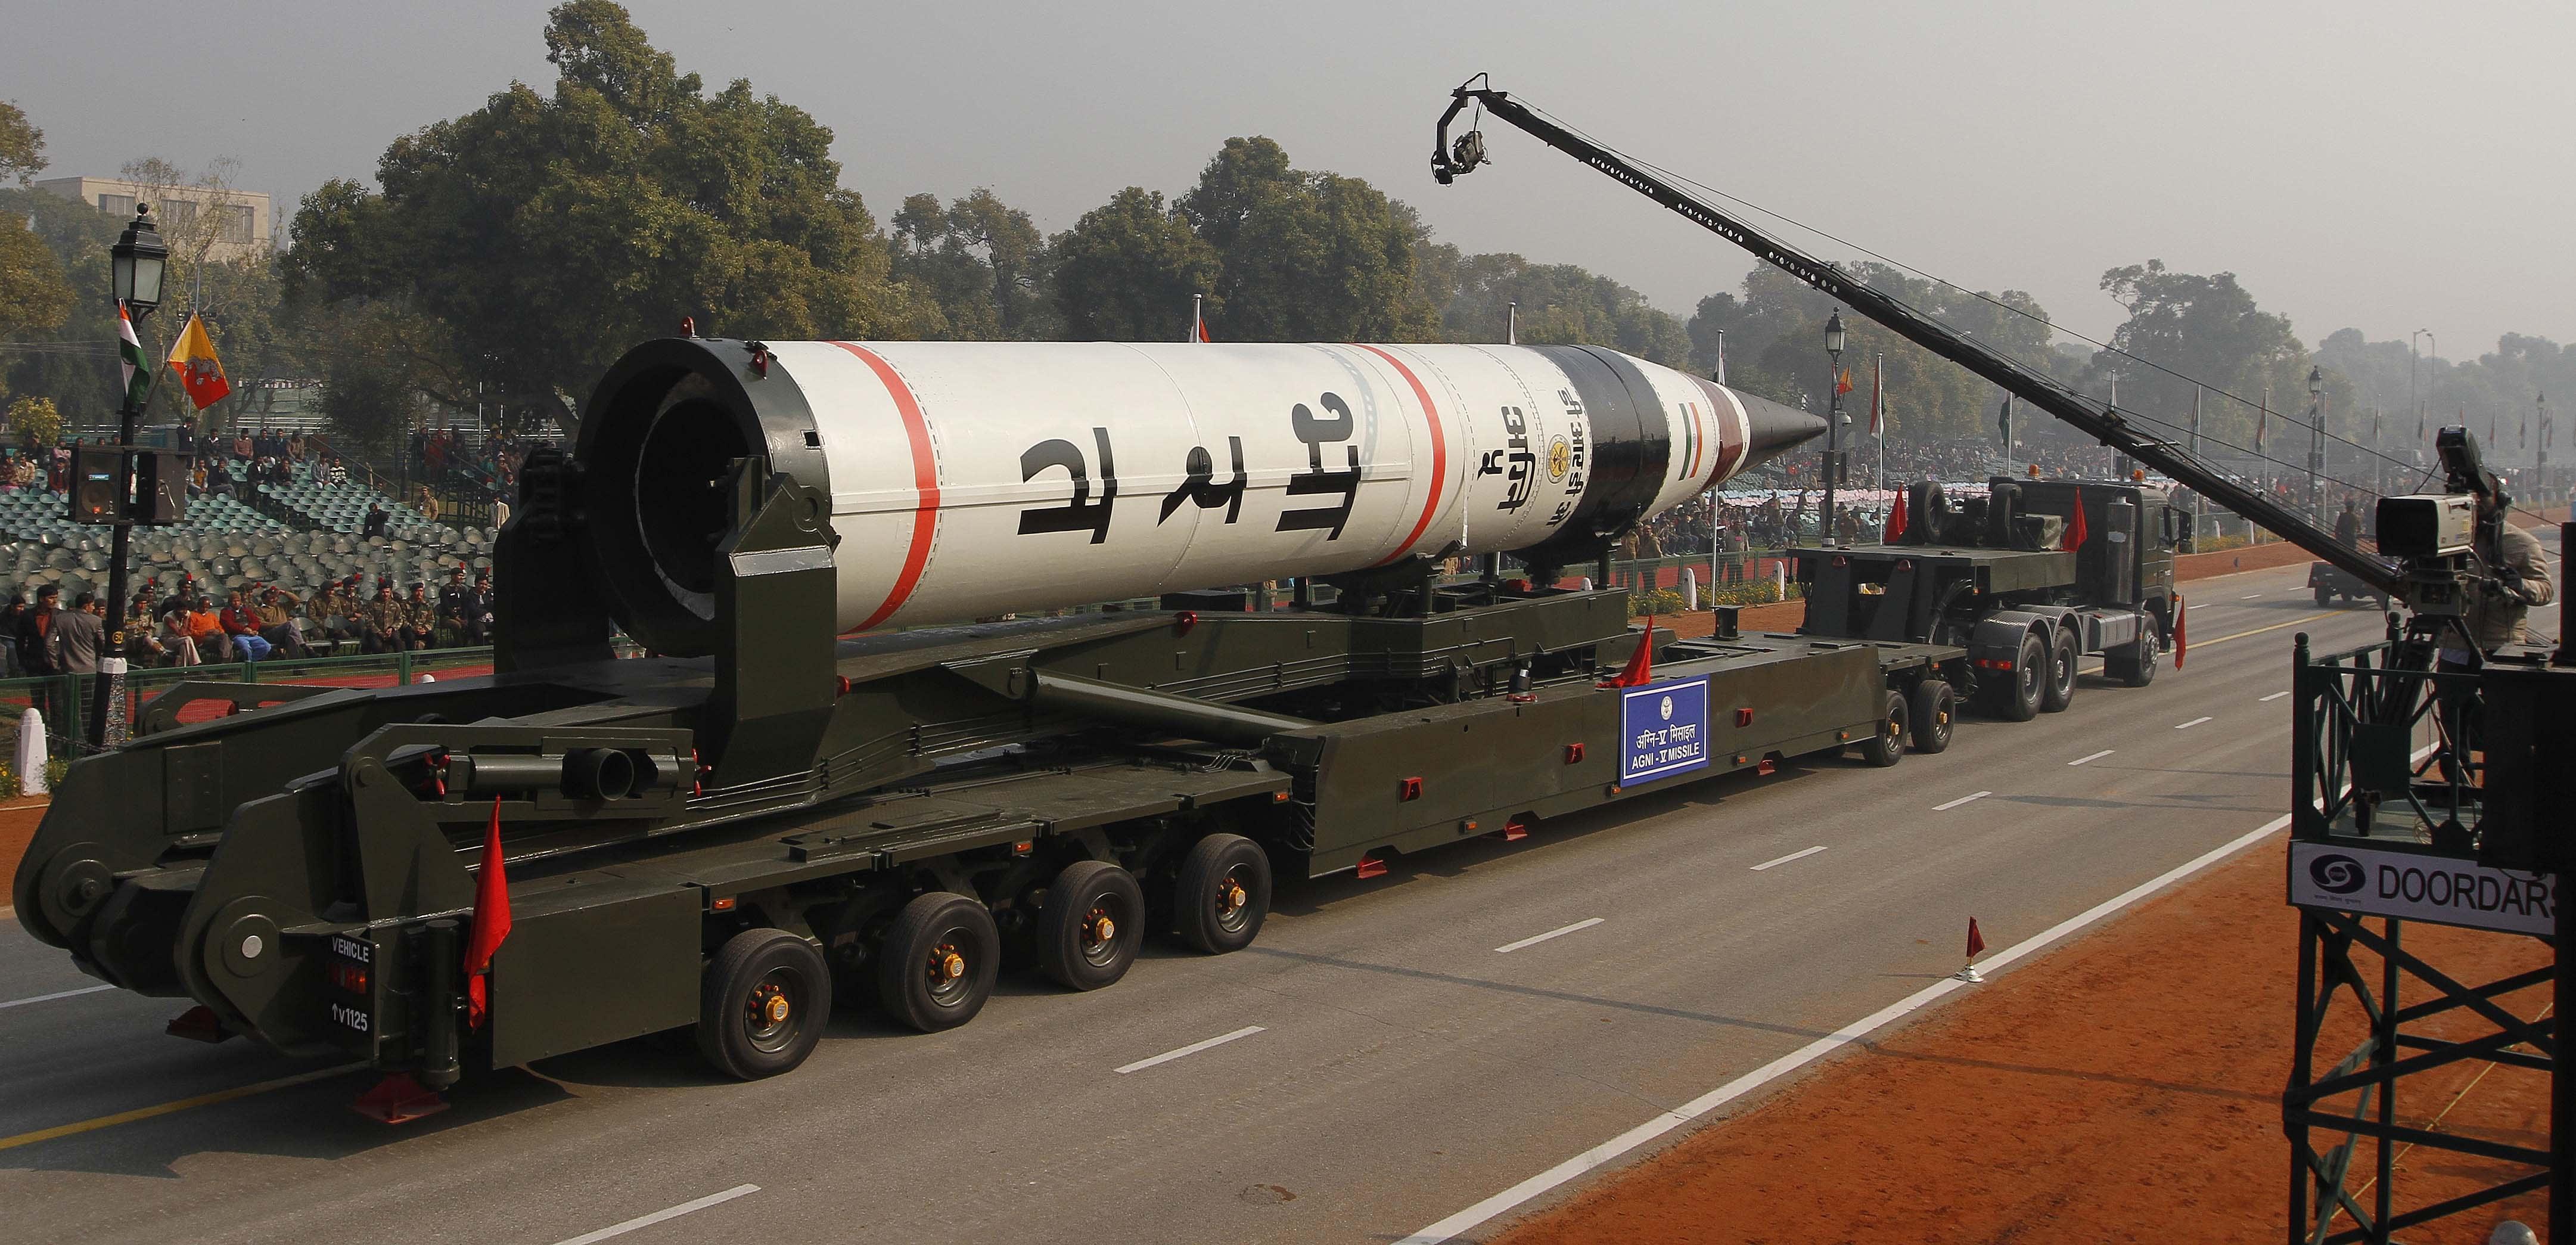 intercontinental ballistic missile india - HD4323×2089